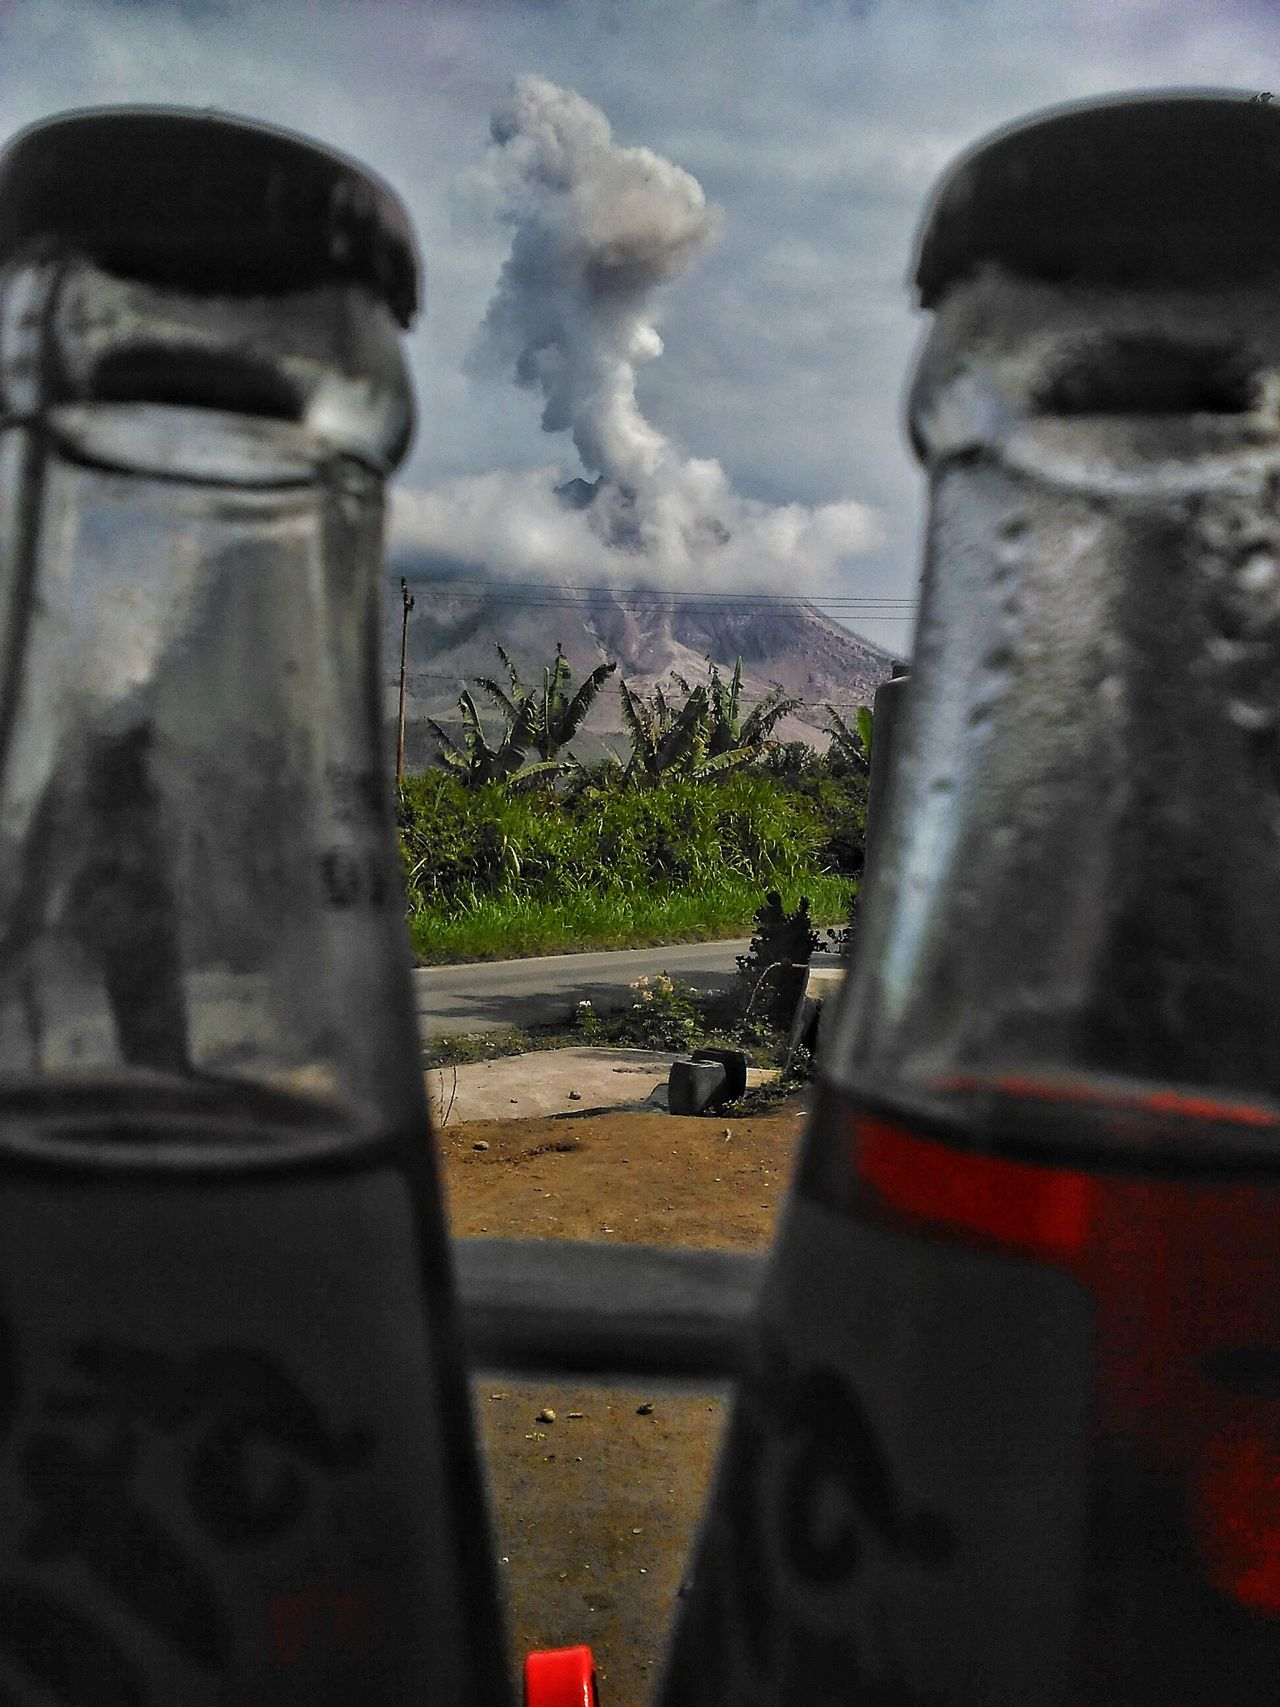 Sinabung eruption today, Sinabung Level IV the alert to resident Sinabung Sumatera Utara Sinabung Masihindonesia Pfimedan Pewartafotoindonesia EyeEm Best Shots EyeEm Nature Lover EyeEm Gallery